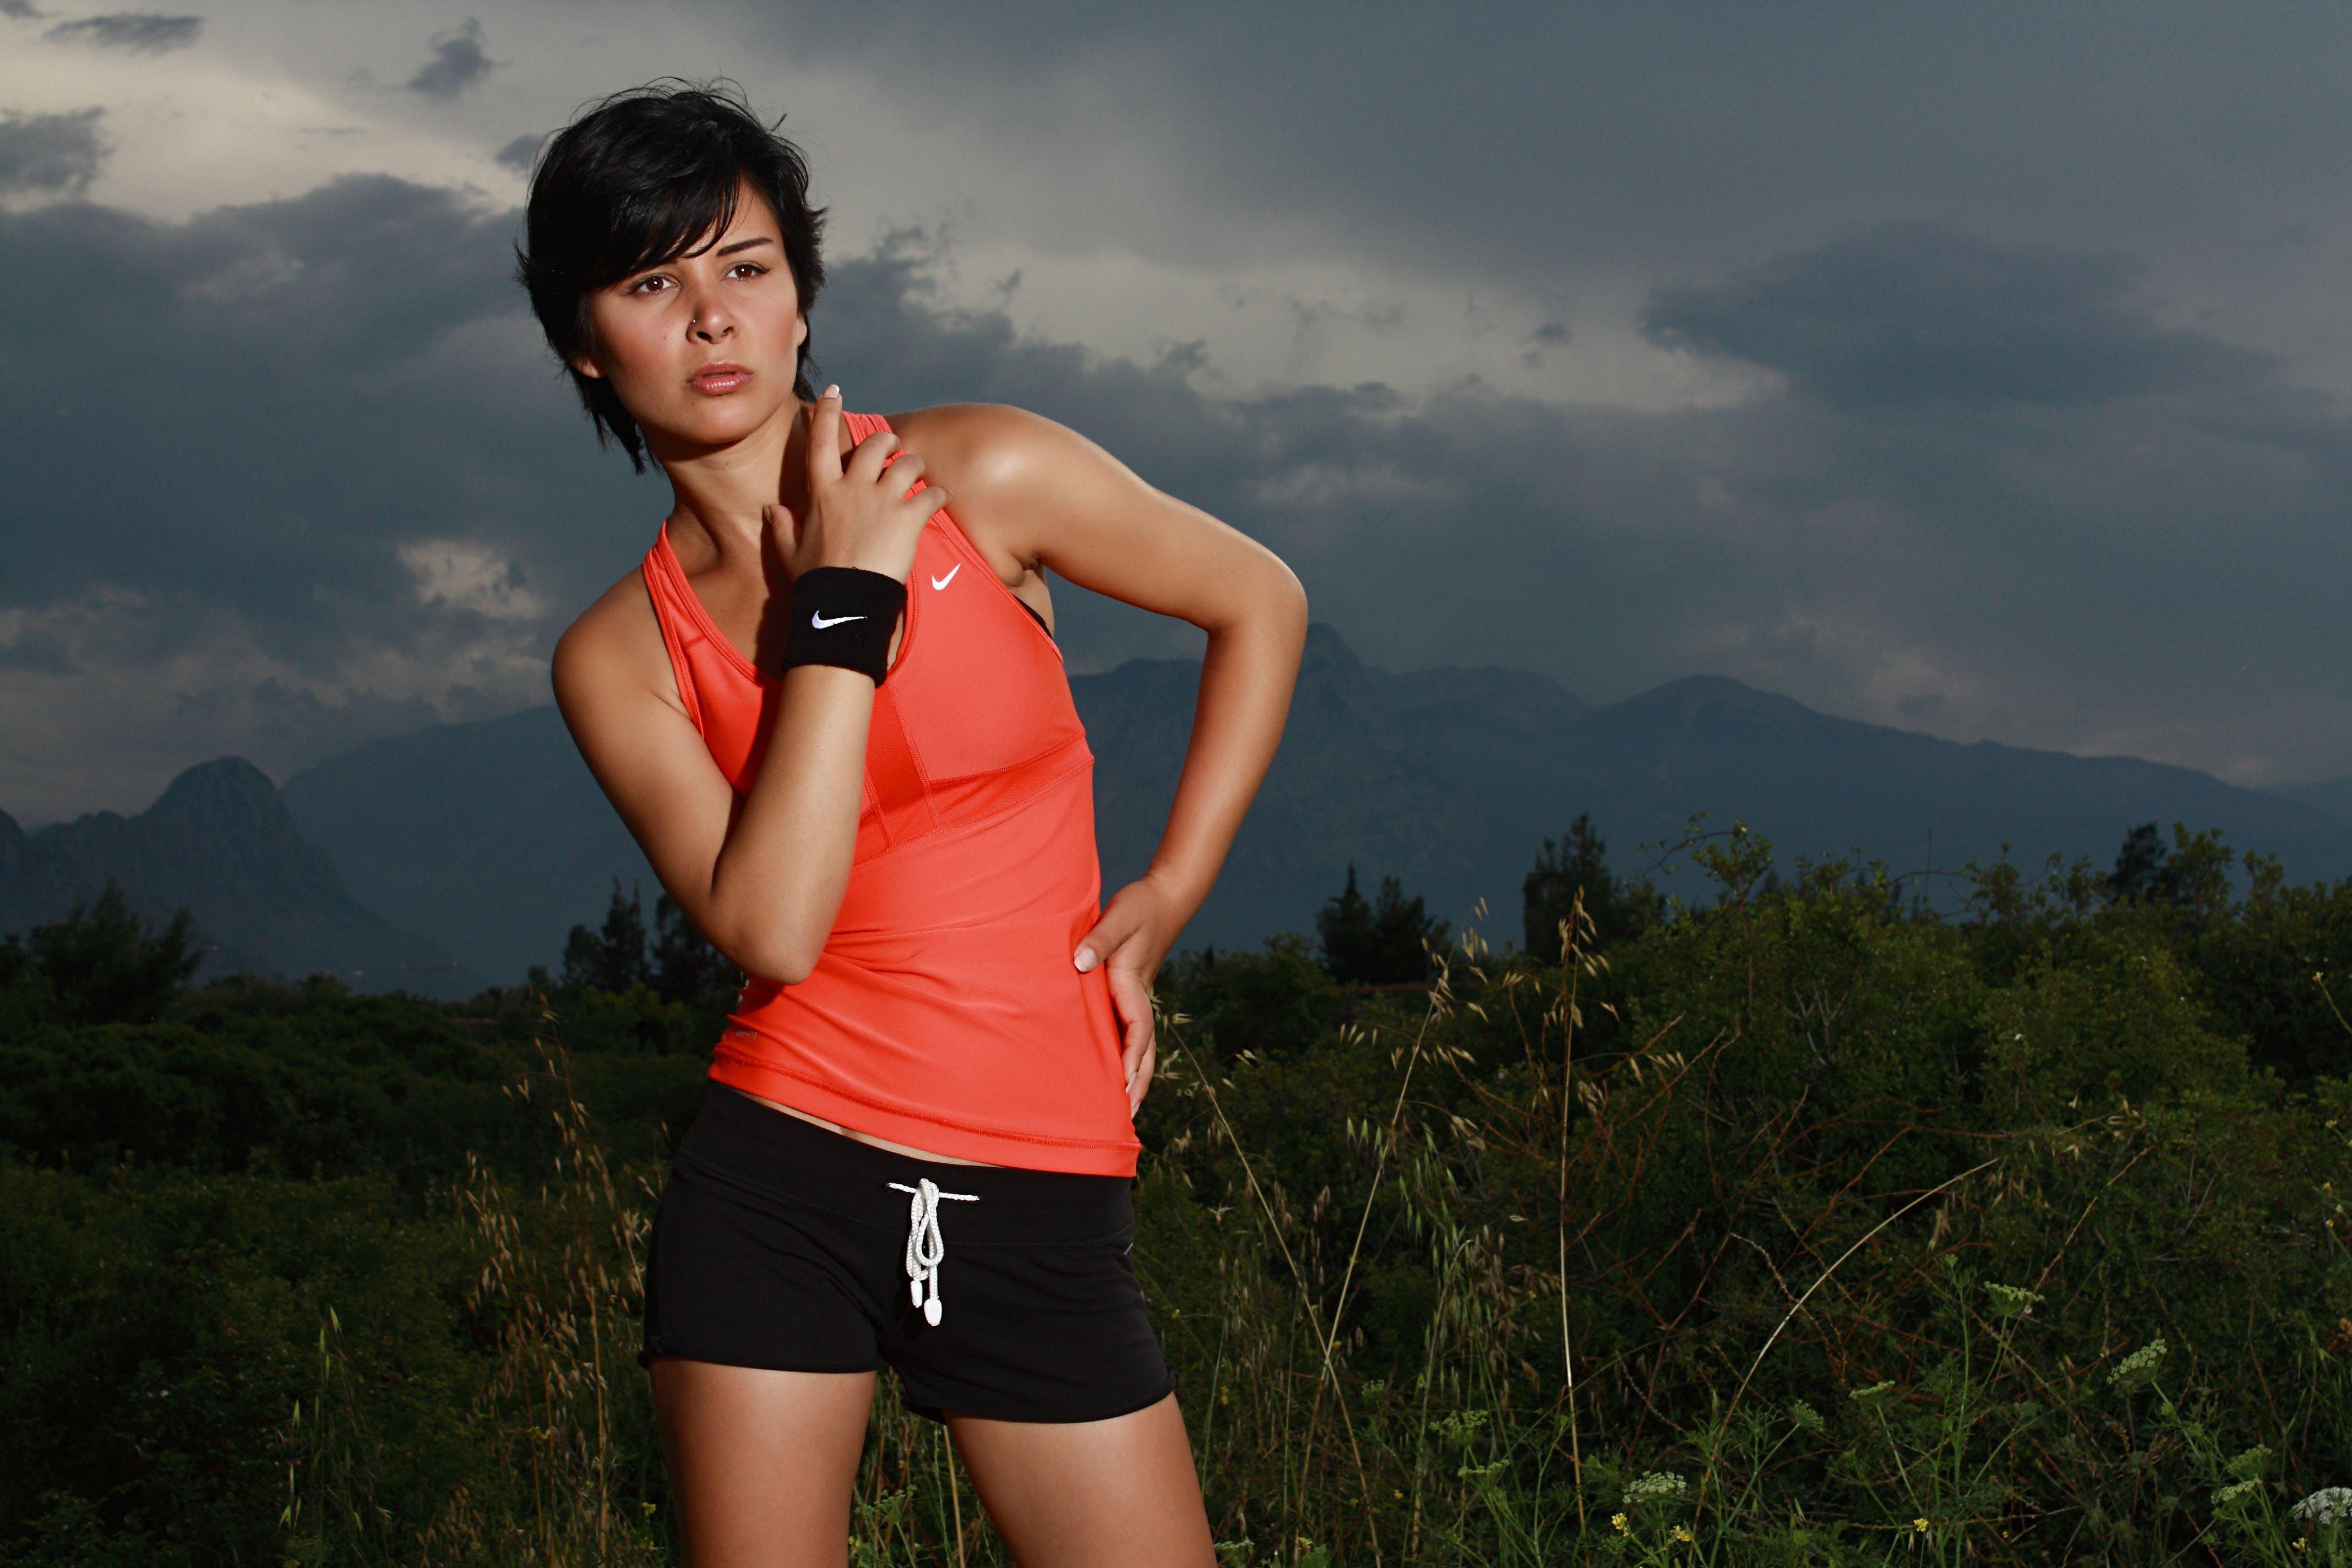 active, clothes, endurance